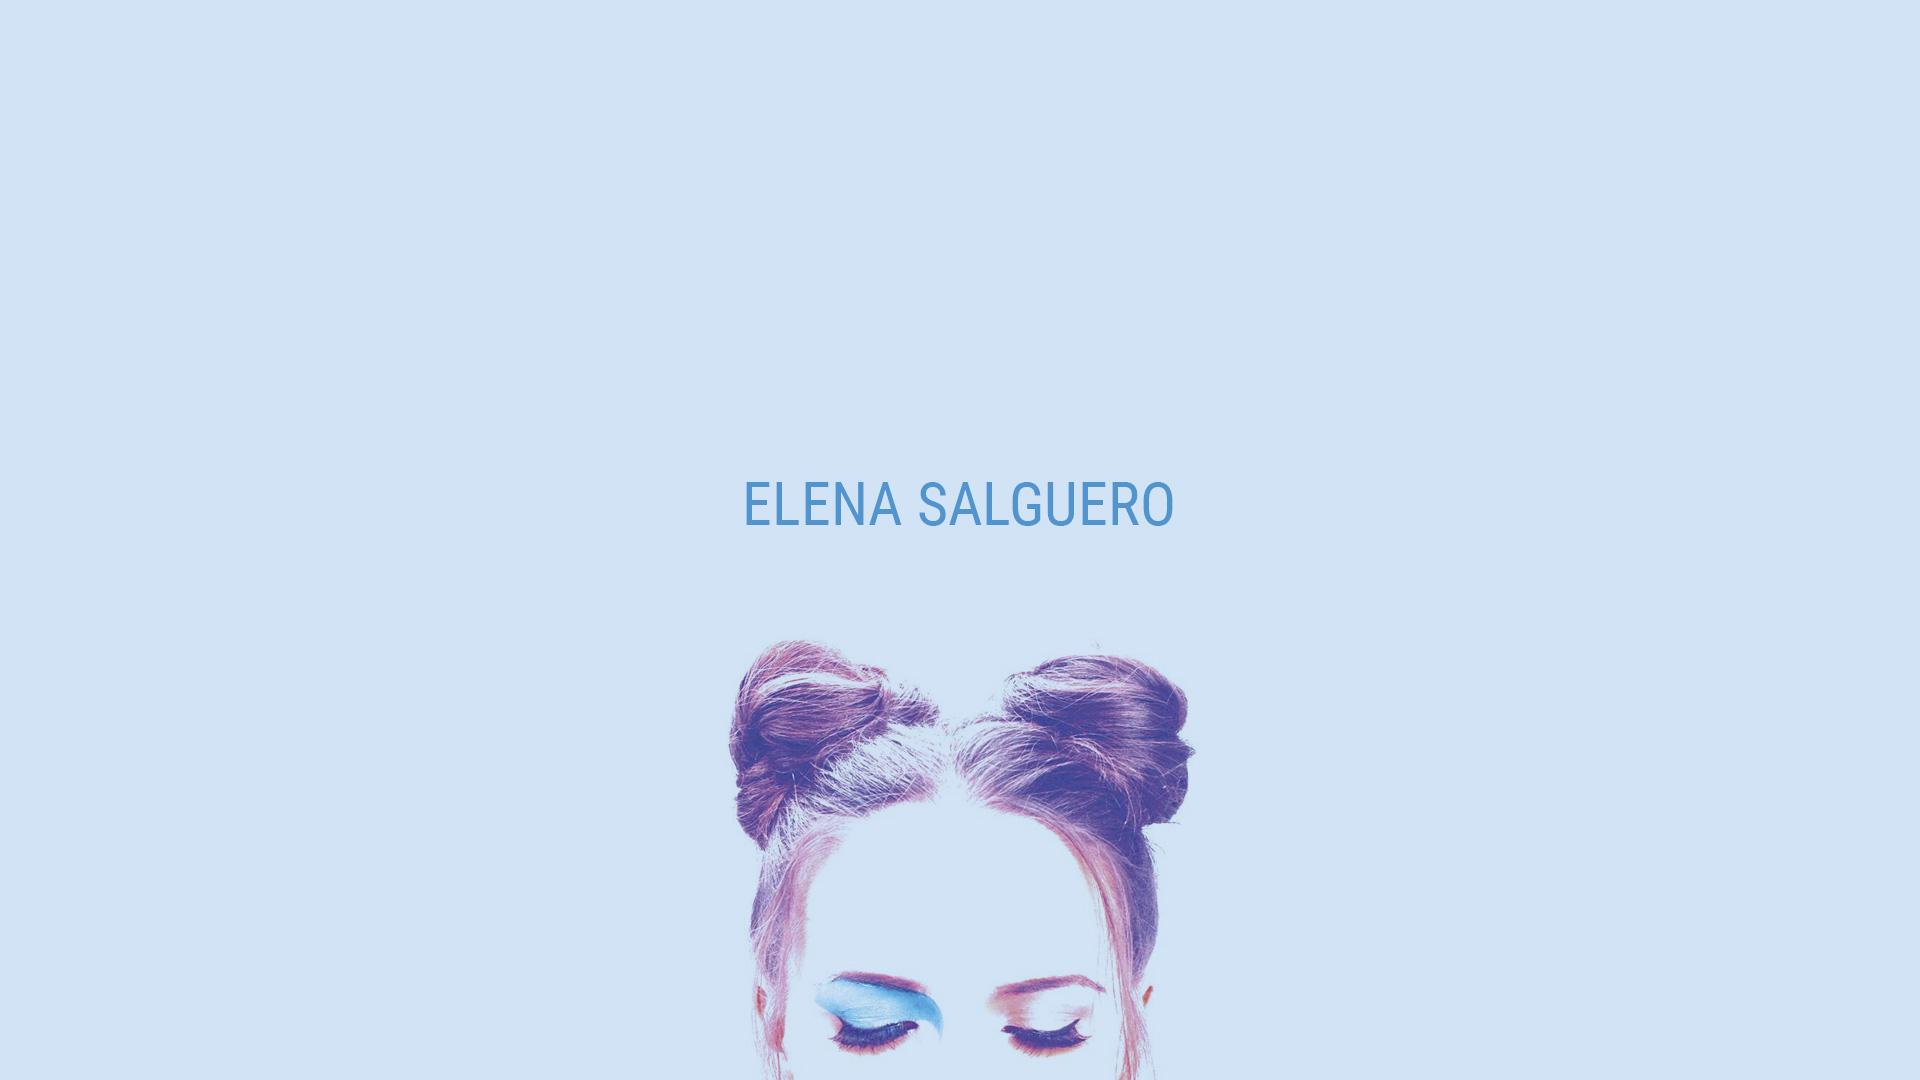 Elena Salguero, web hecha por murciègalo